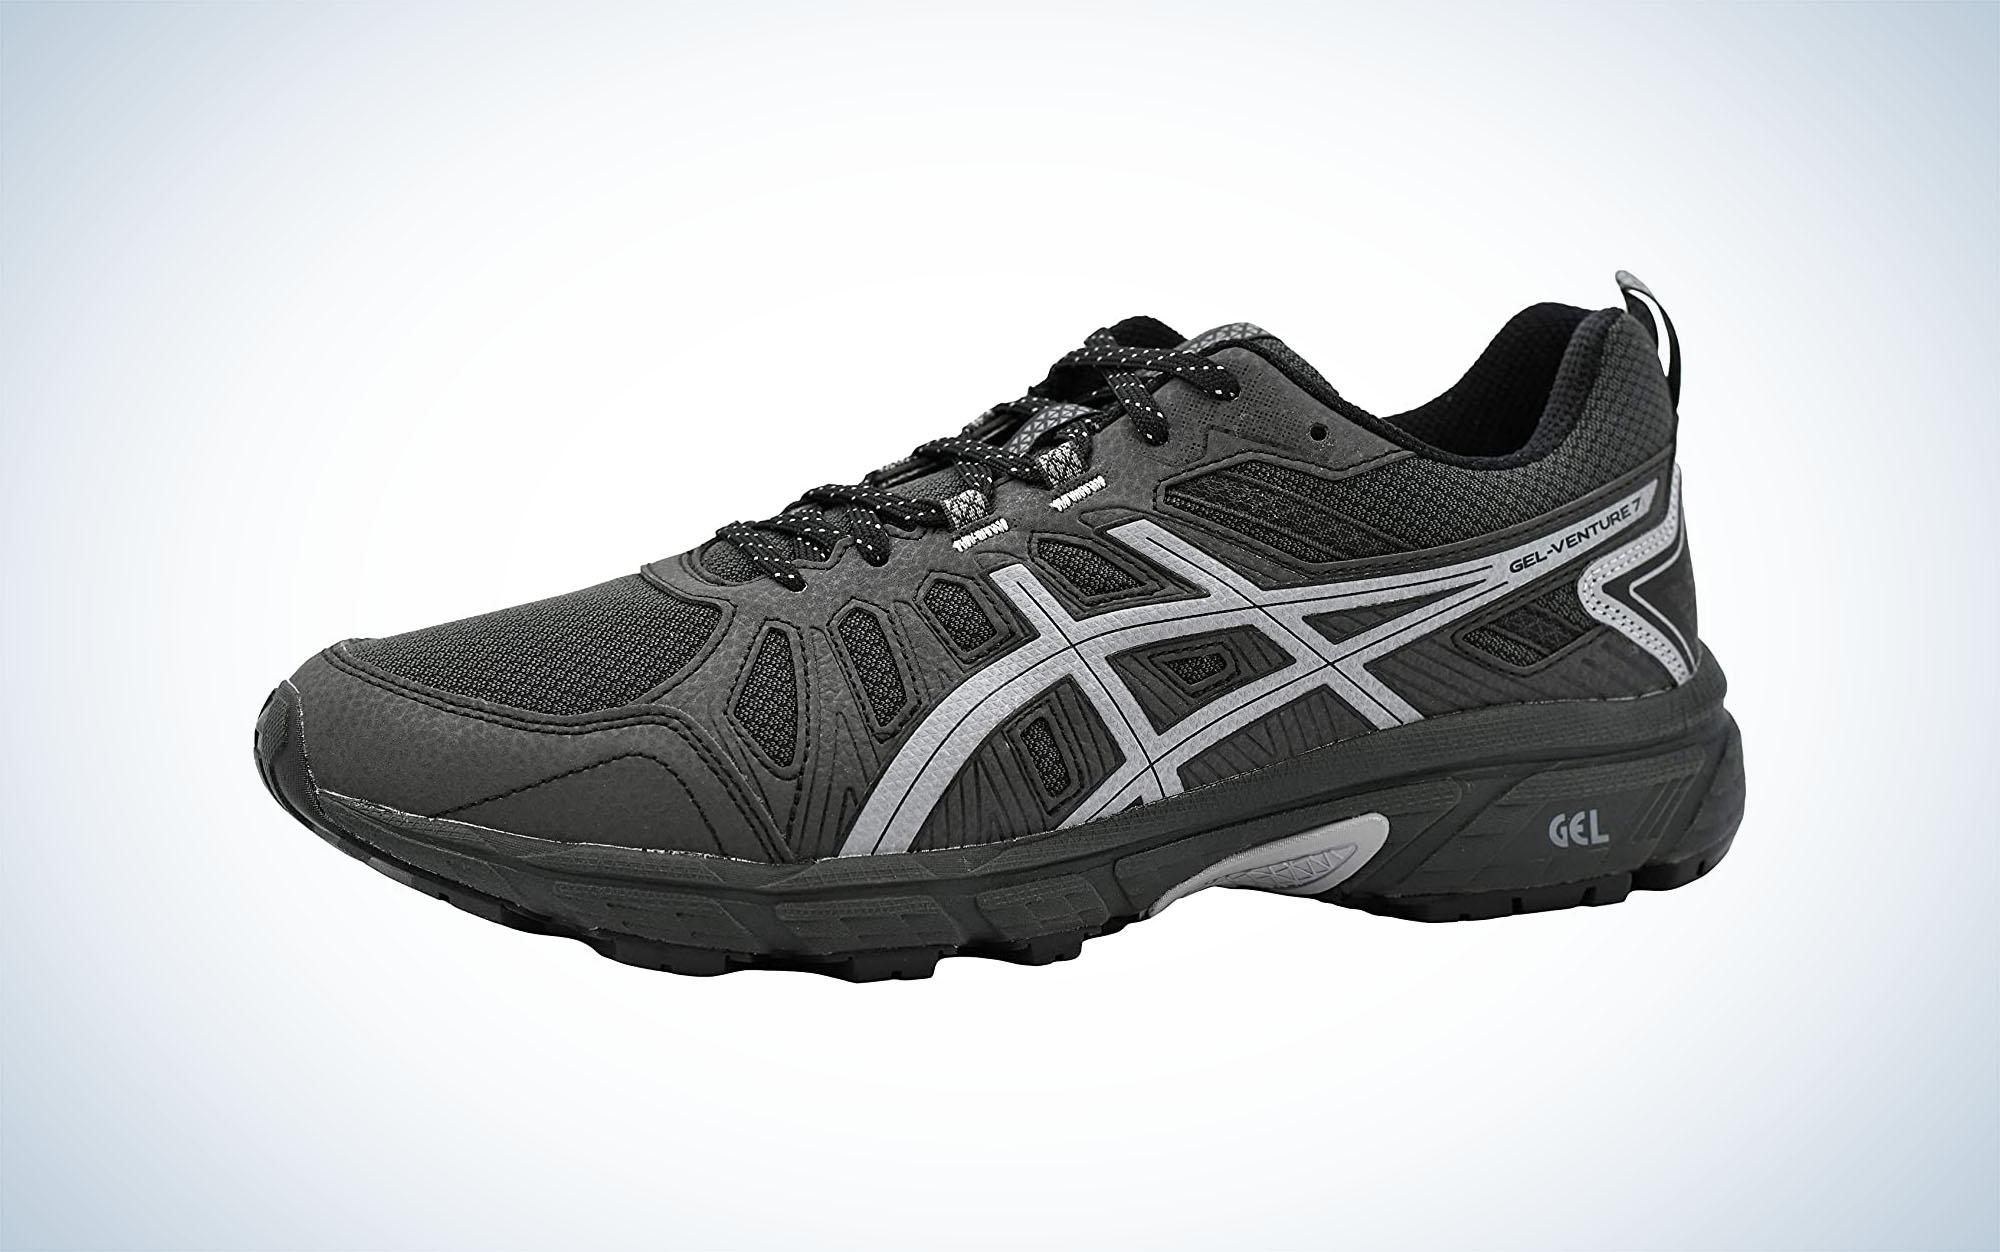 ASICS Men's Gel-Venture 7 Trail Running Shoes are some of the best ASICS running shoes for men.